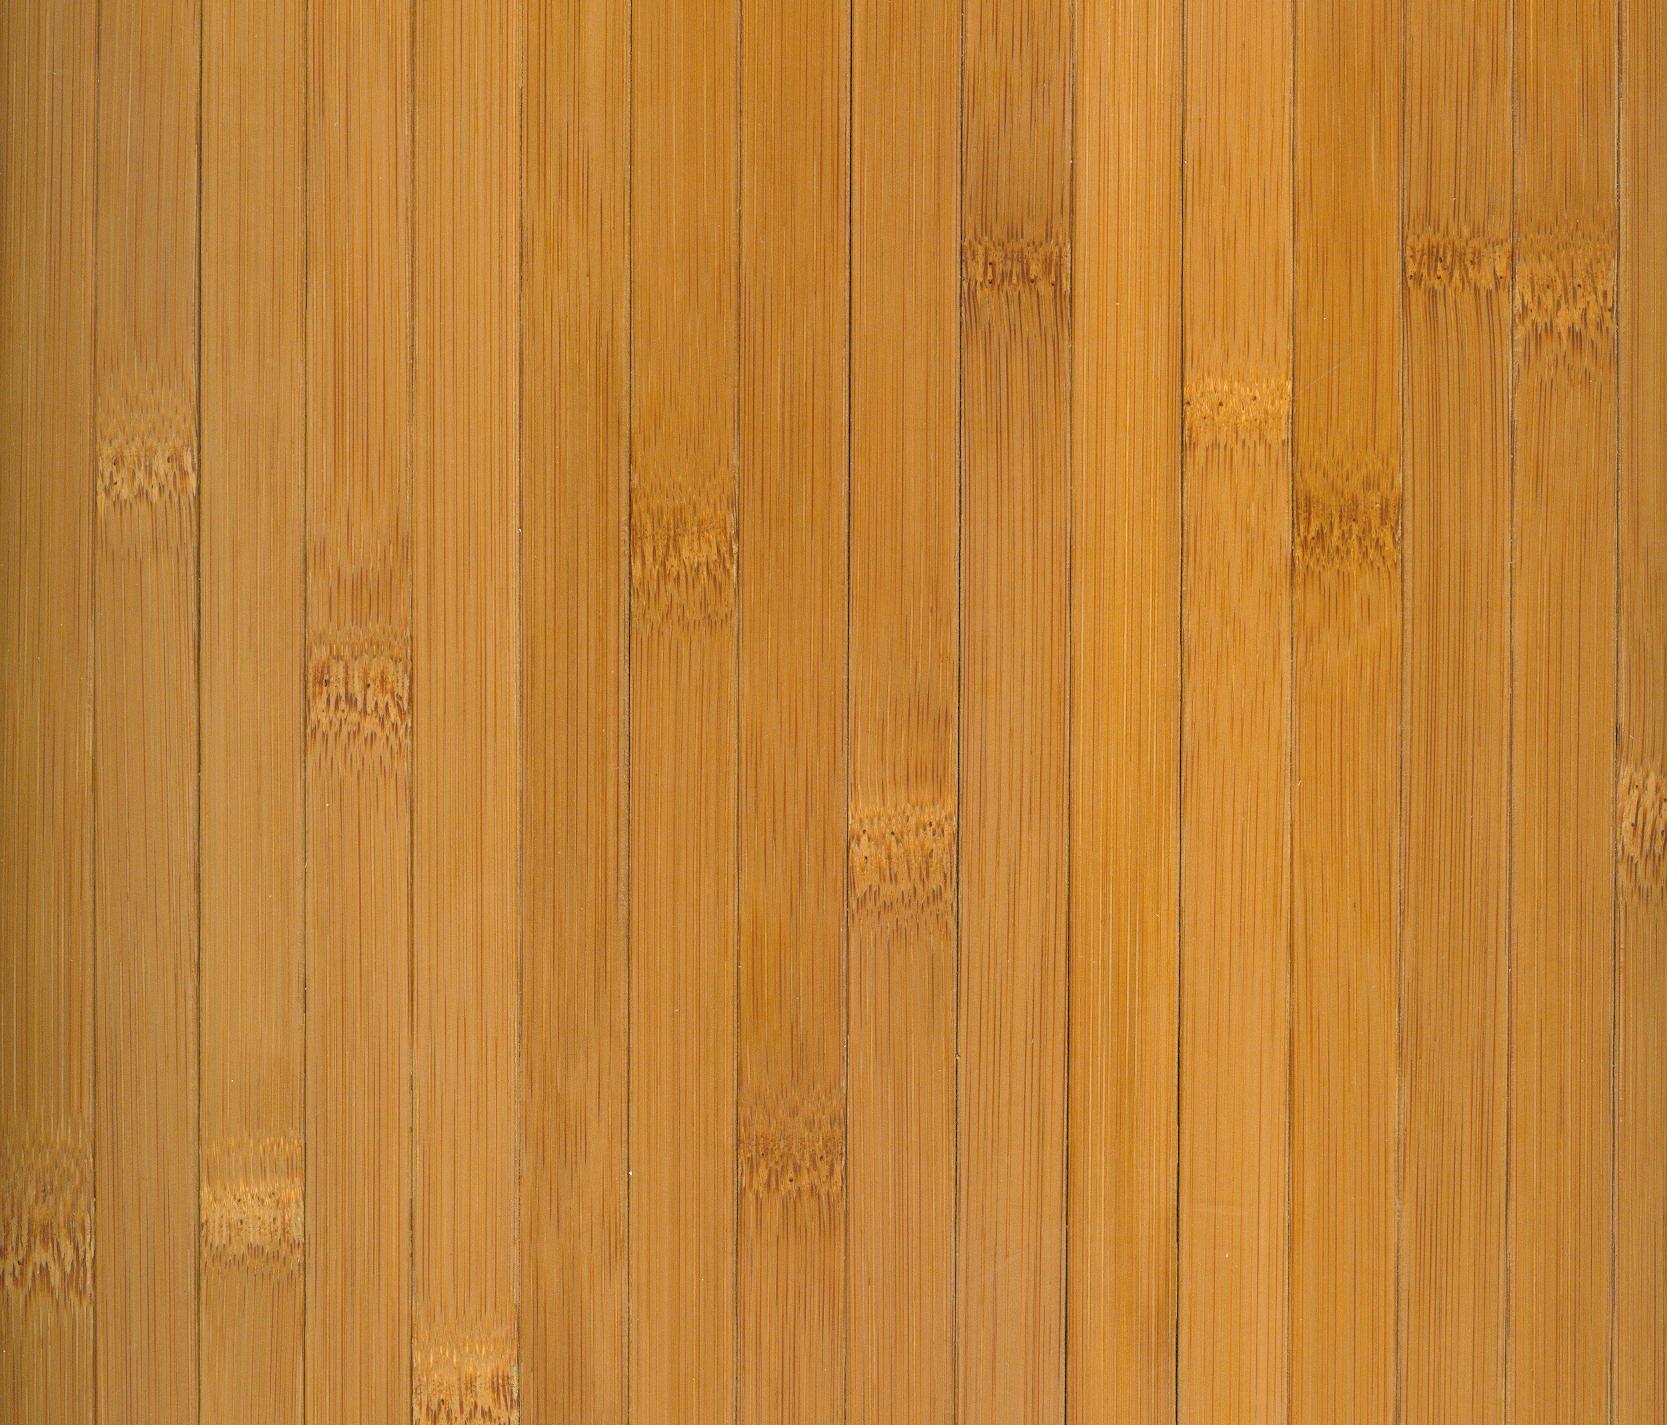 Bamboo Flooring Noise: UNIBAMBOO PLAINPRESSED CARAMEL